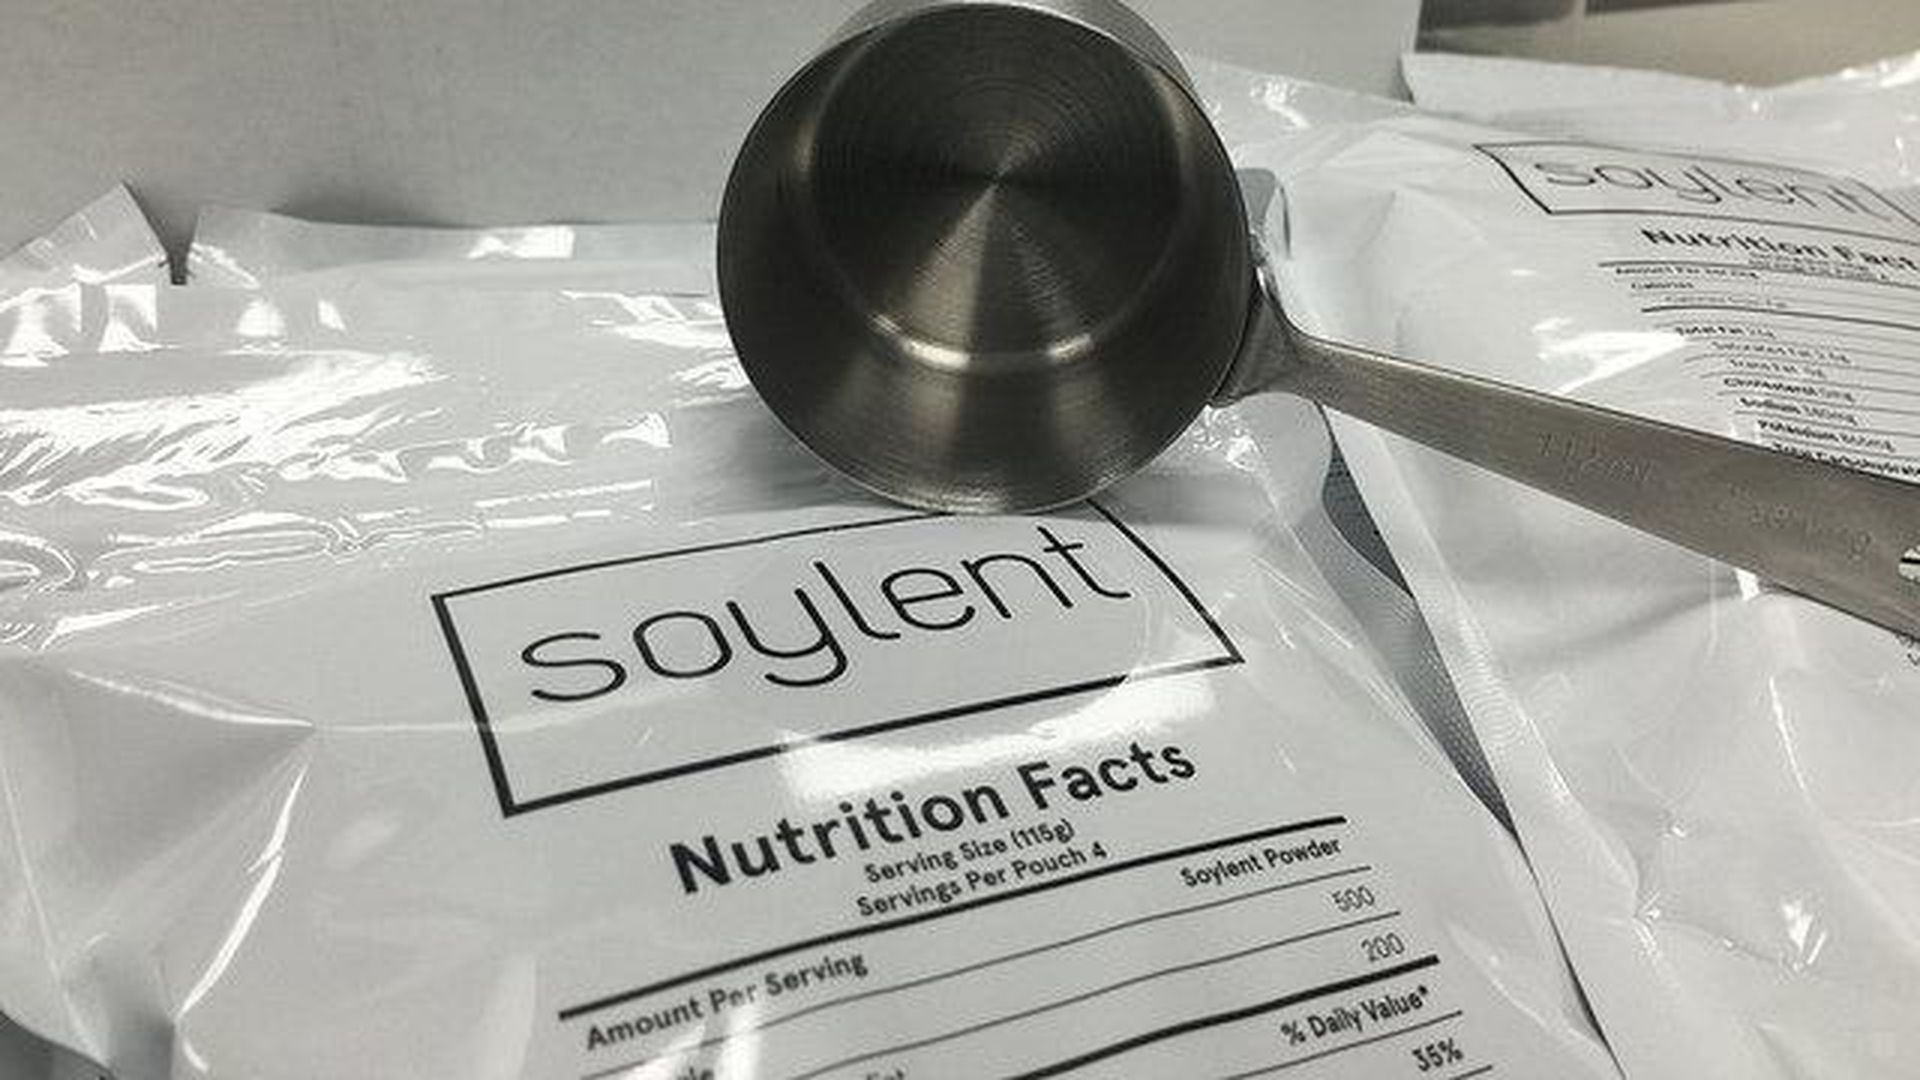 Food substitute Soylent raises $50 million amid recalls